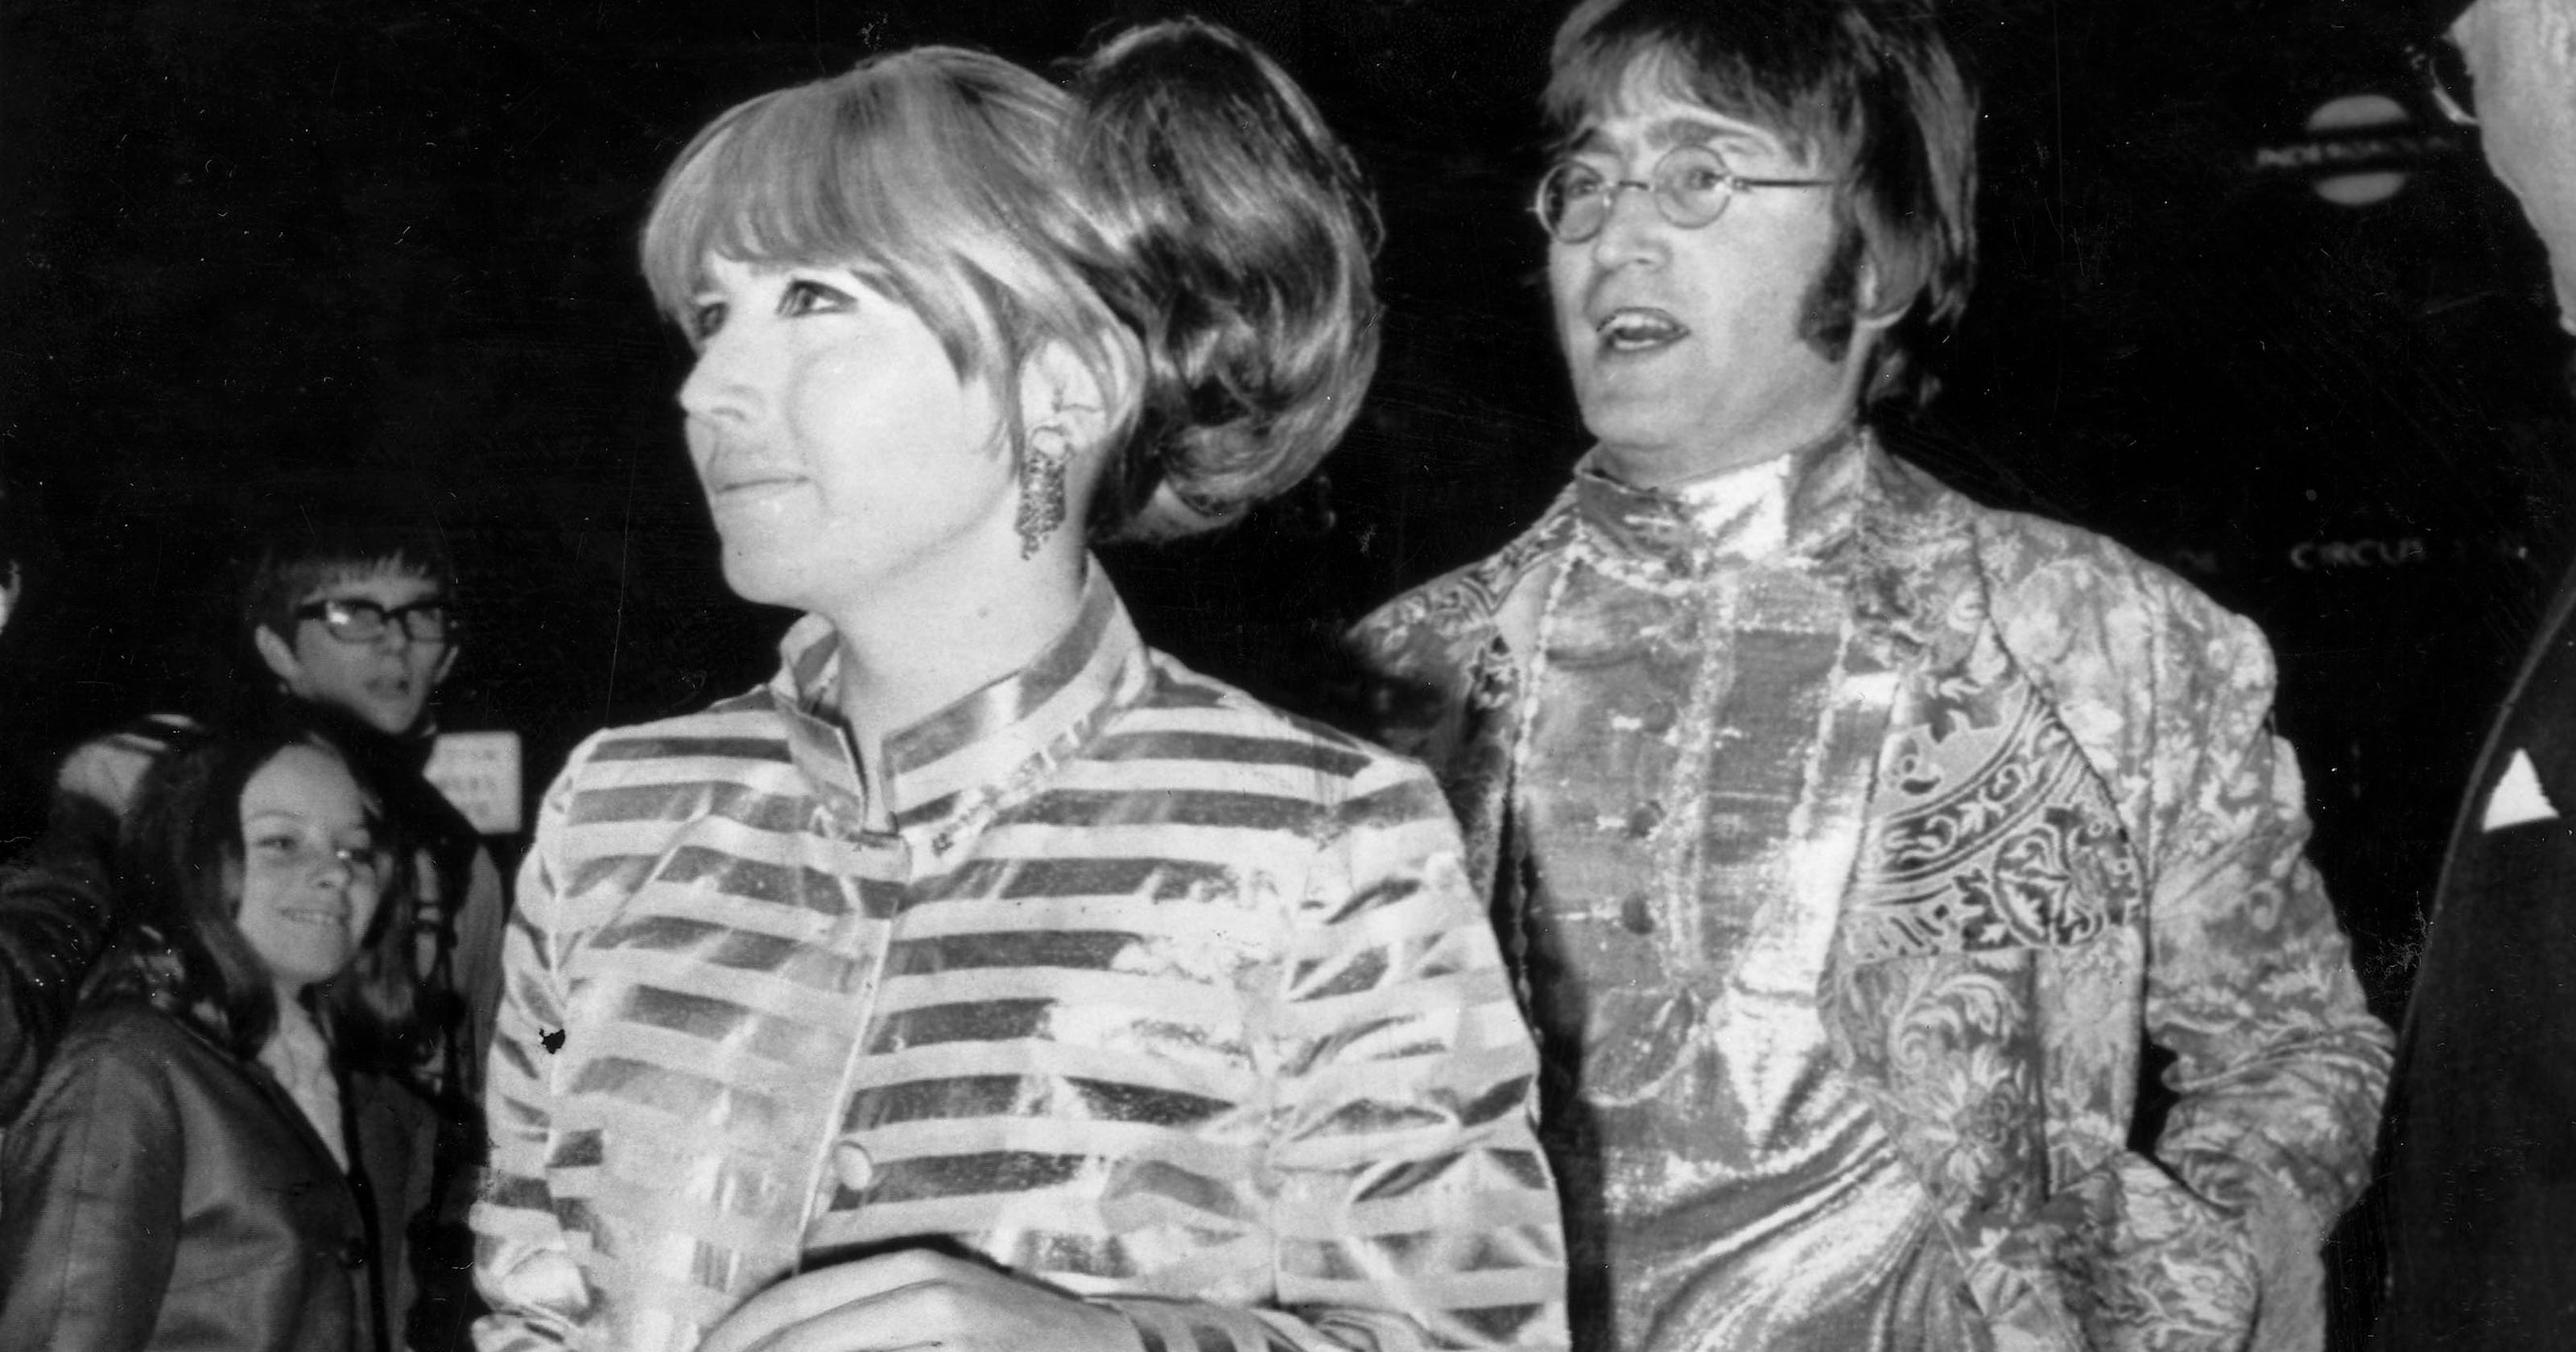 John Lennons Ex Wife Cynthia Lennon Dies